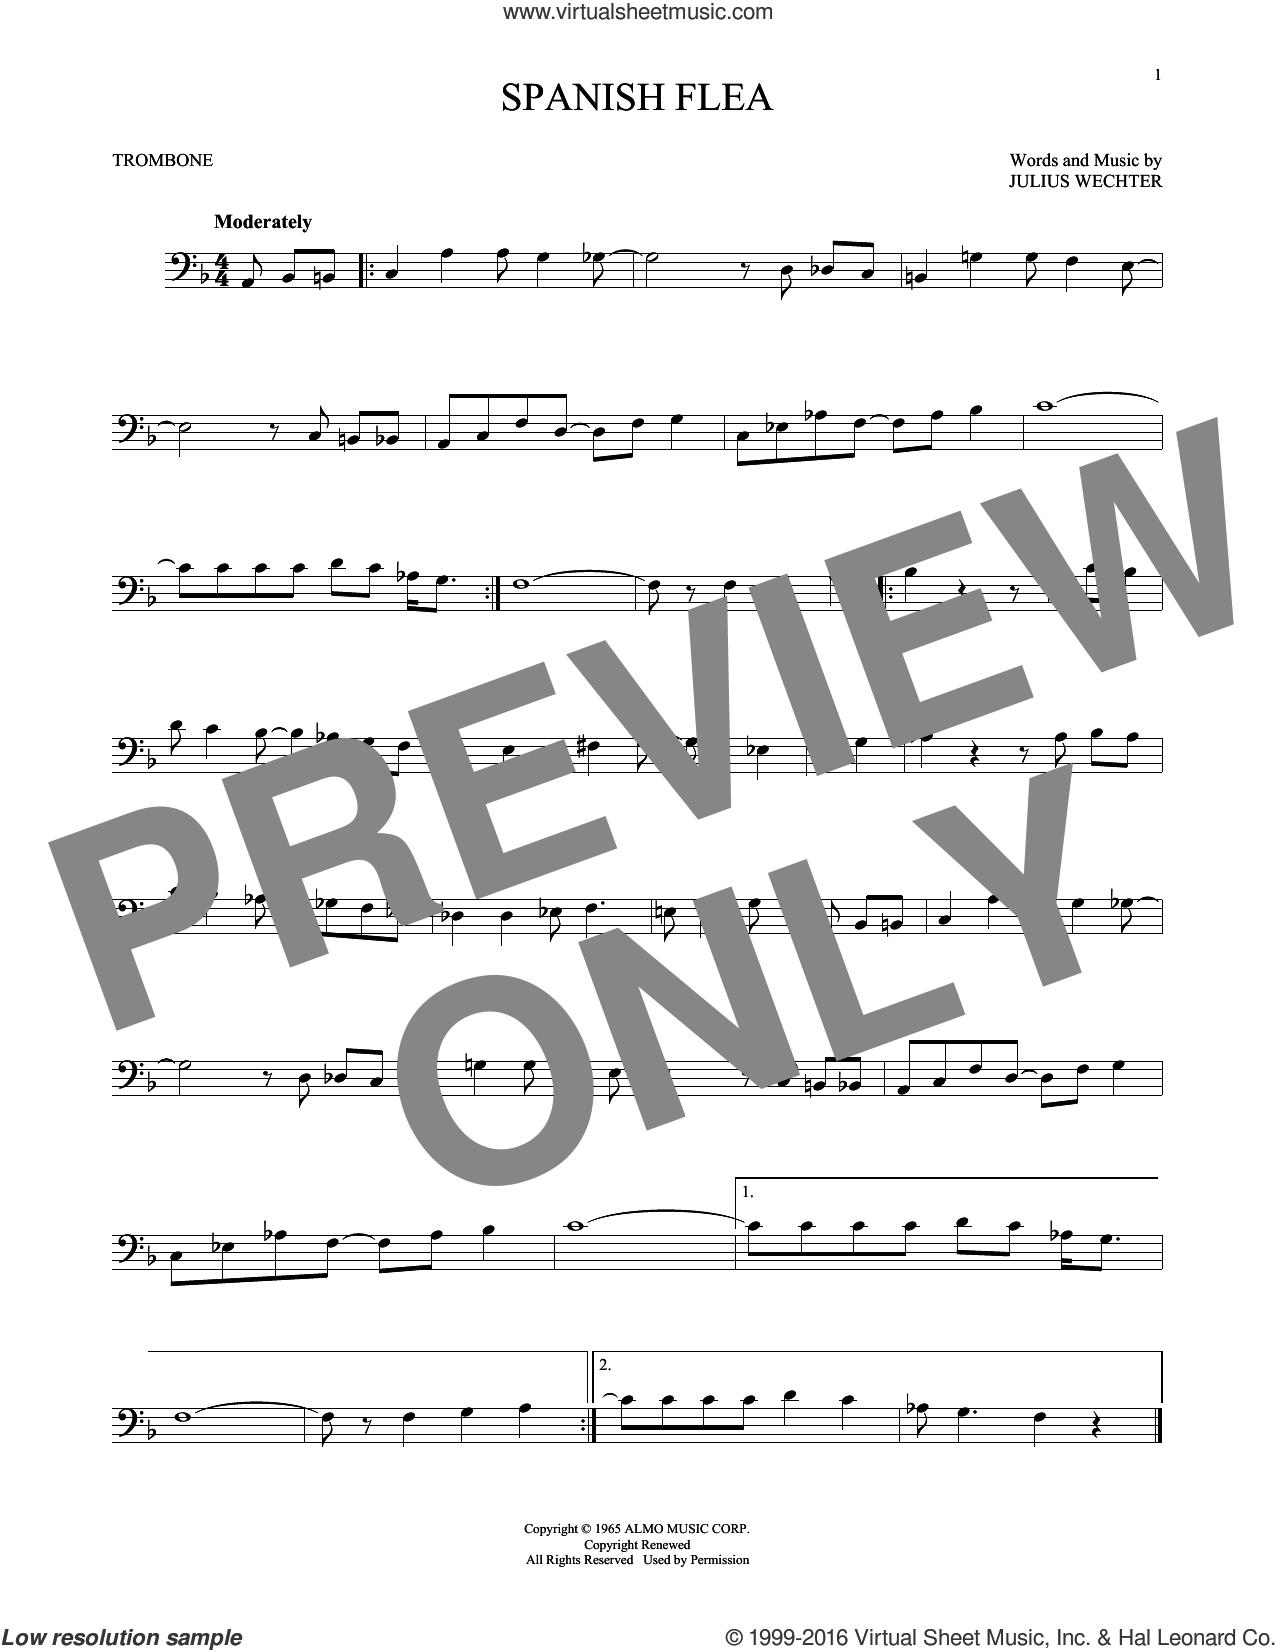 Spanish Flea sheet music for trombone solo by Herb Alpert & The Tijuana Brass and Julius Wechter, intermediate skill level